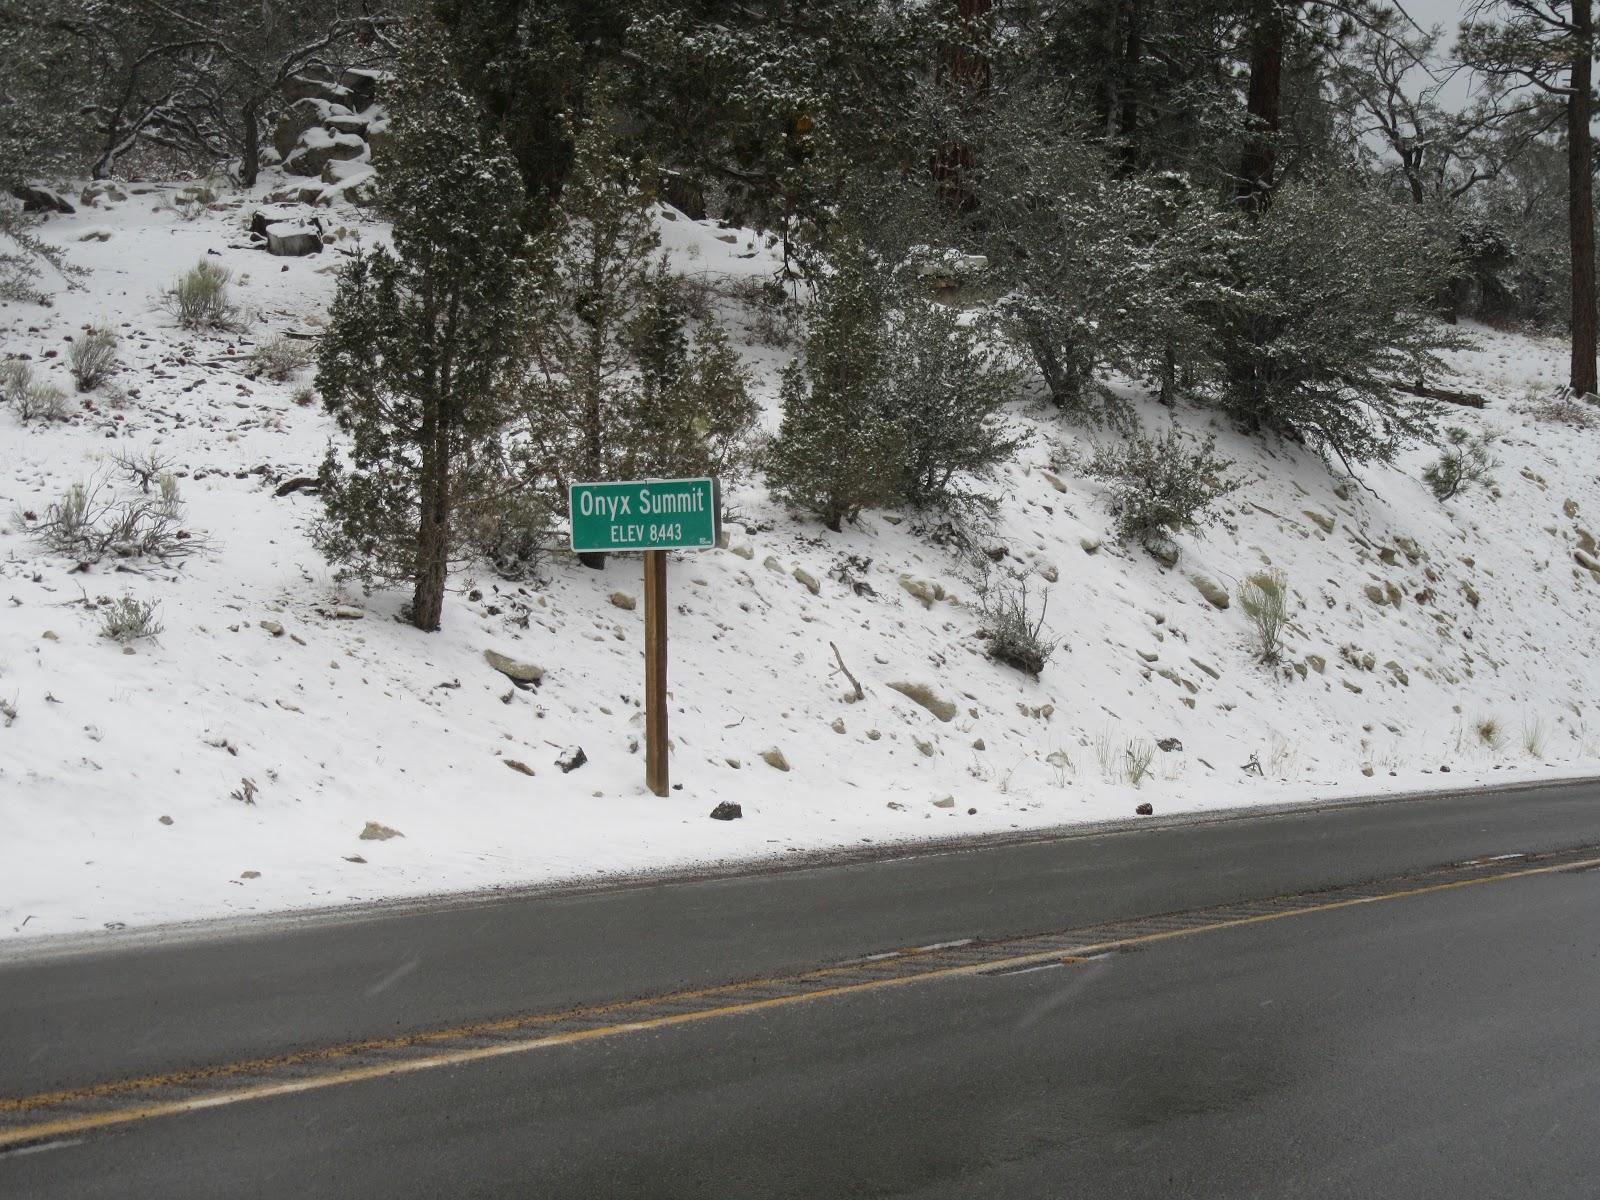 Onyx Summit bike ride - summit sign